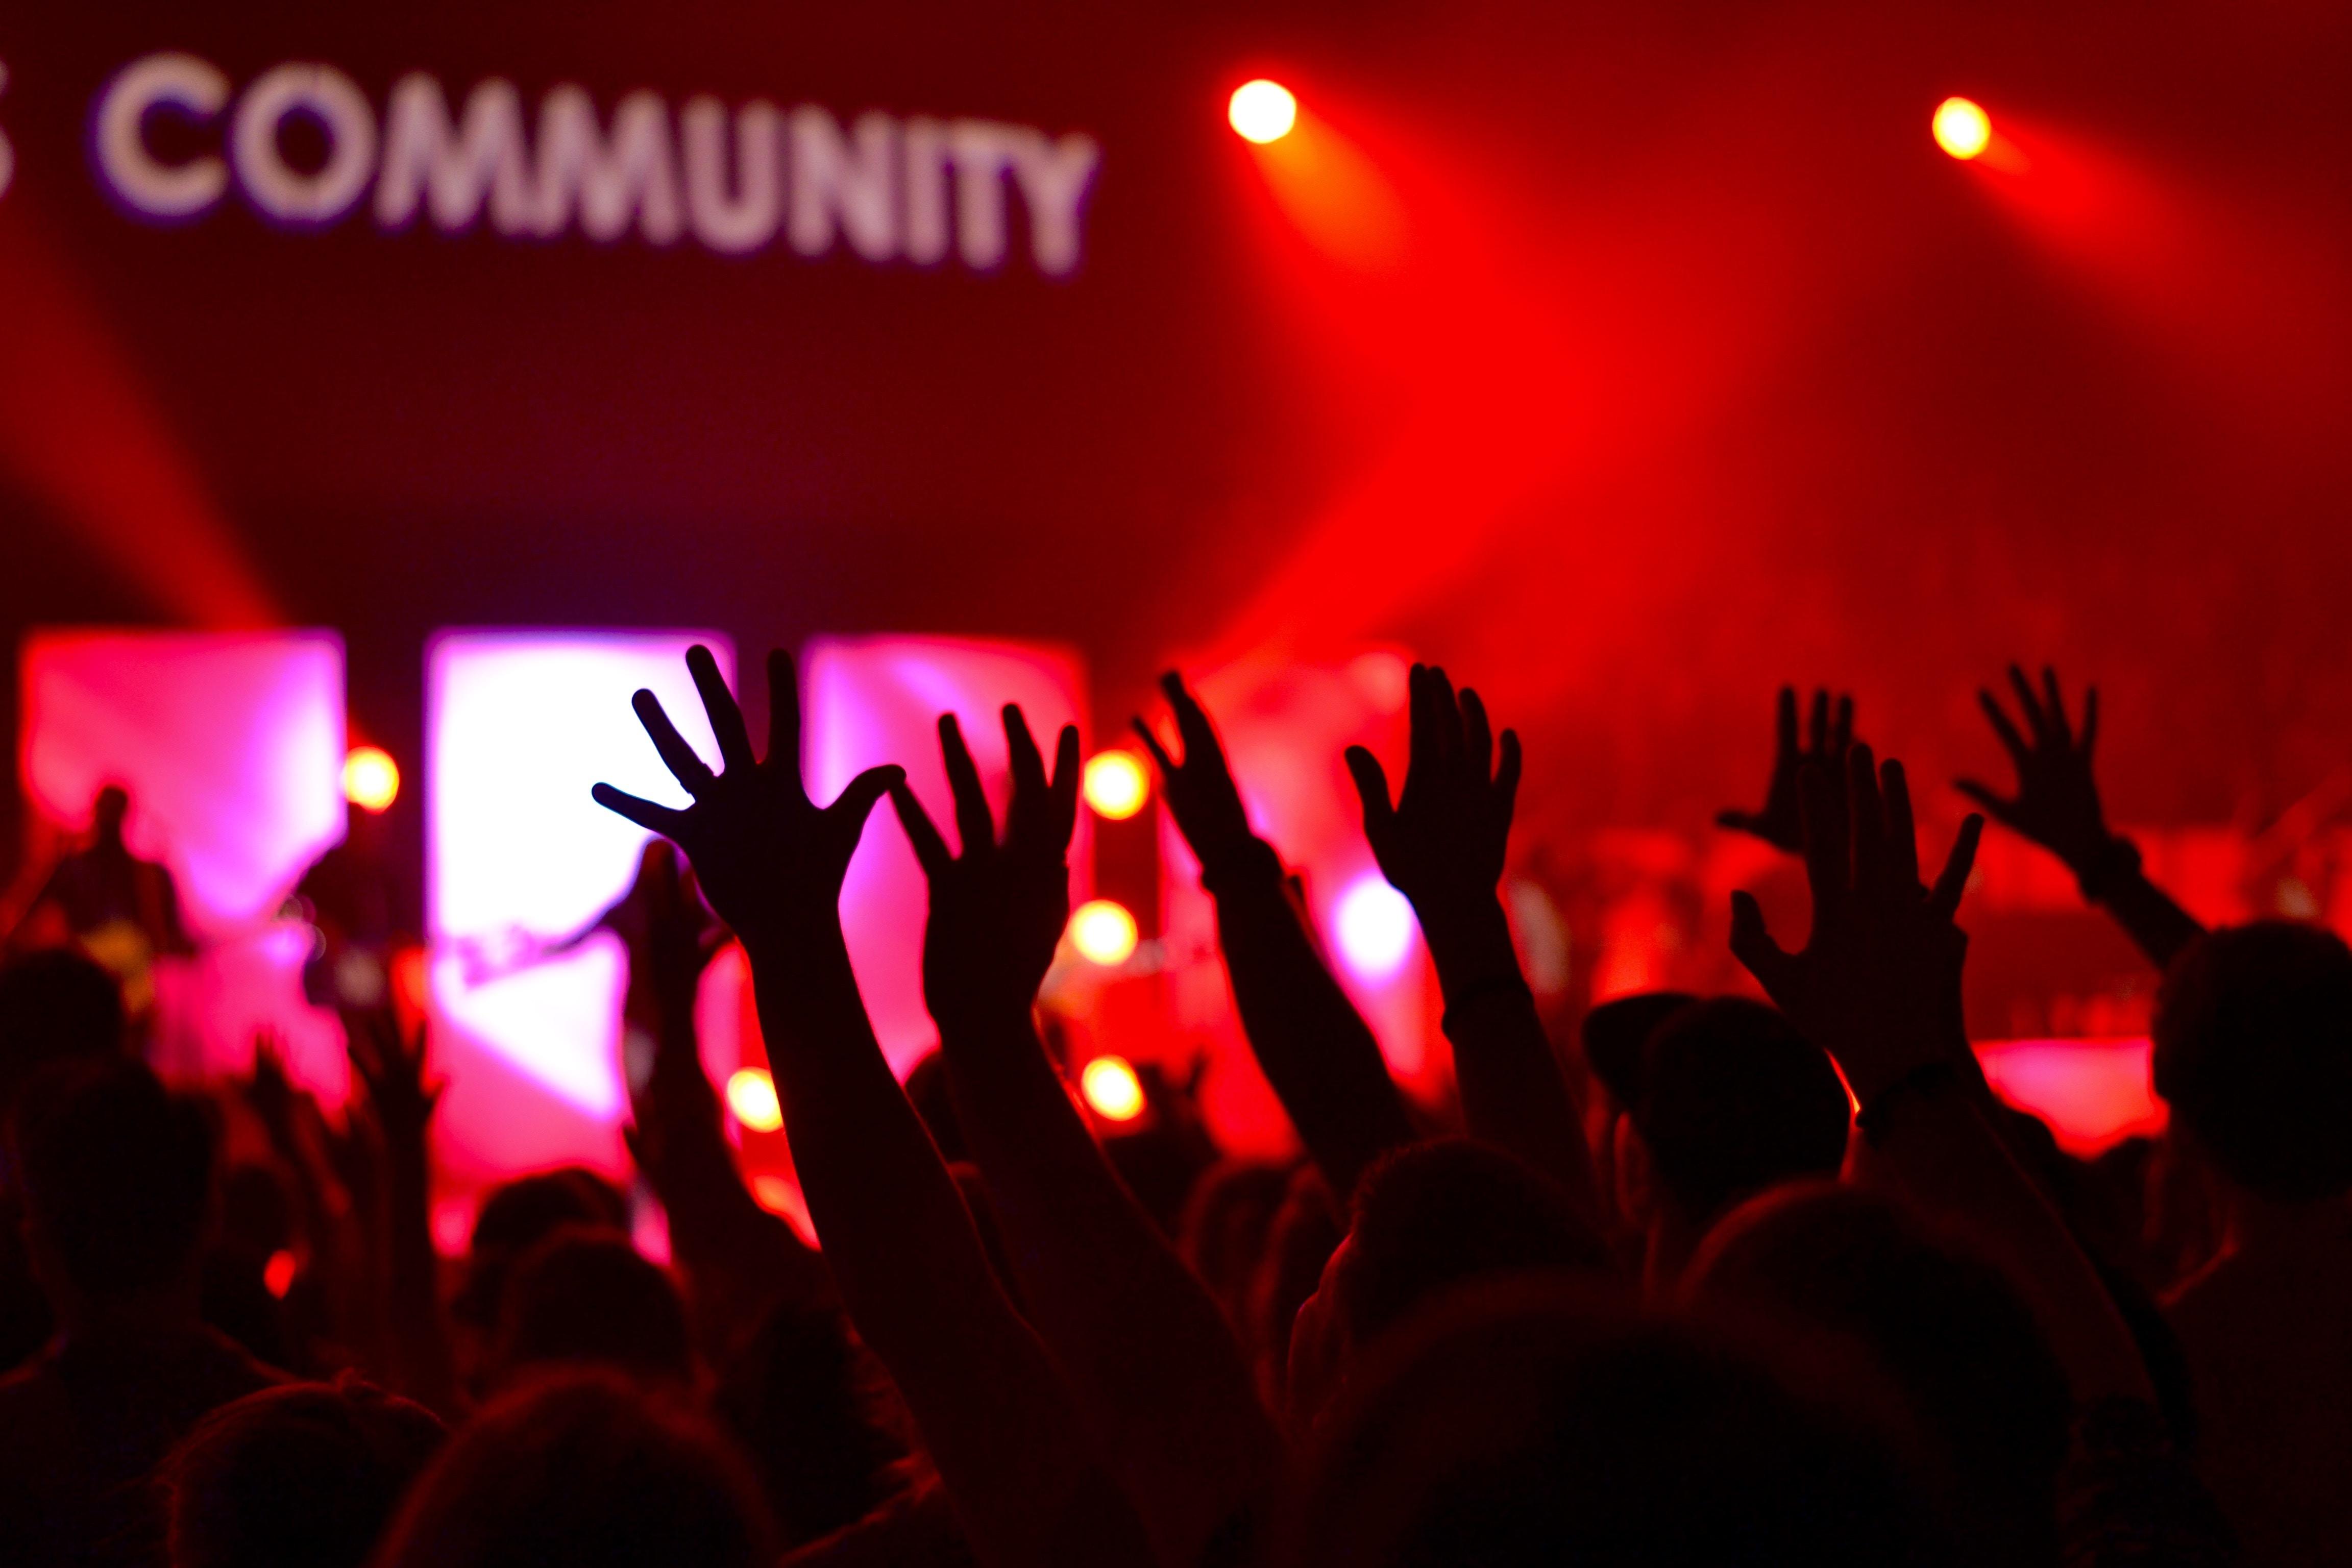 community blog into a brand